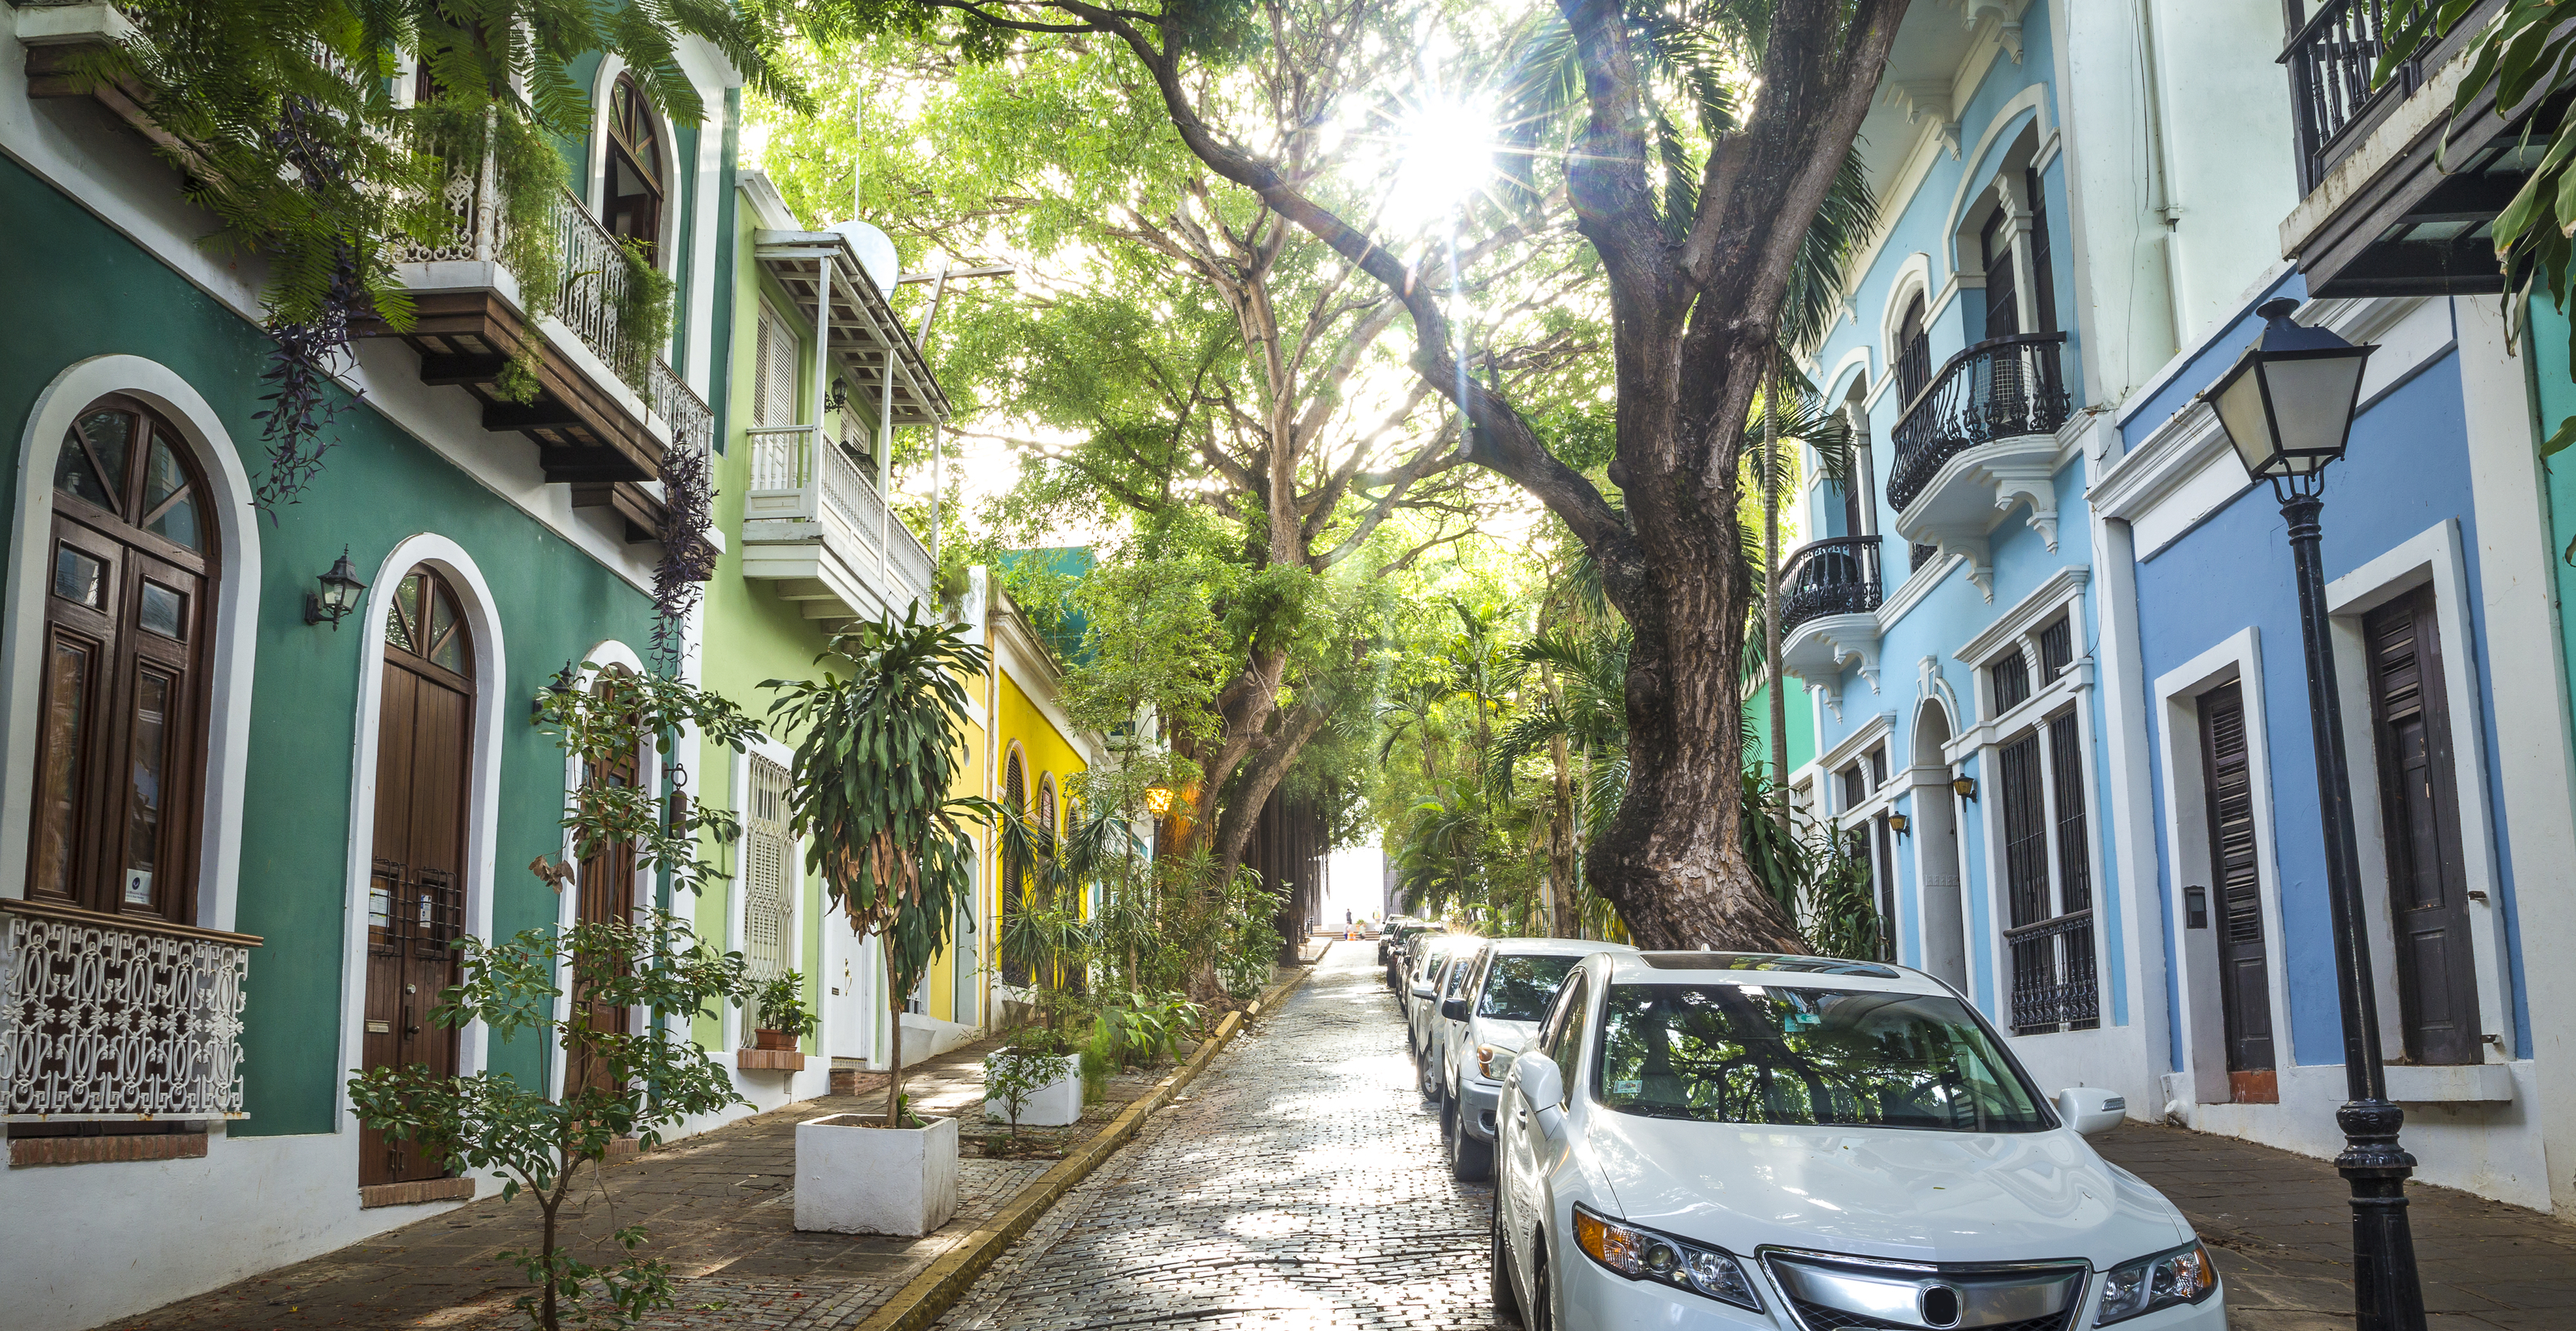 Old-San-Juan-Puerto-Rico-street.jpg?mtime=20171219193850#asset:99320